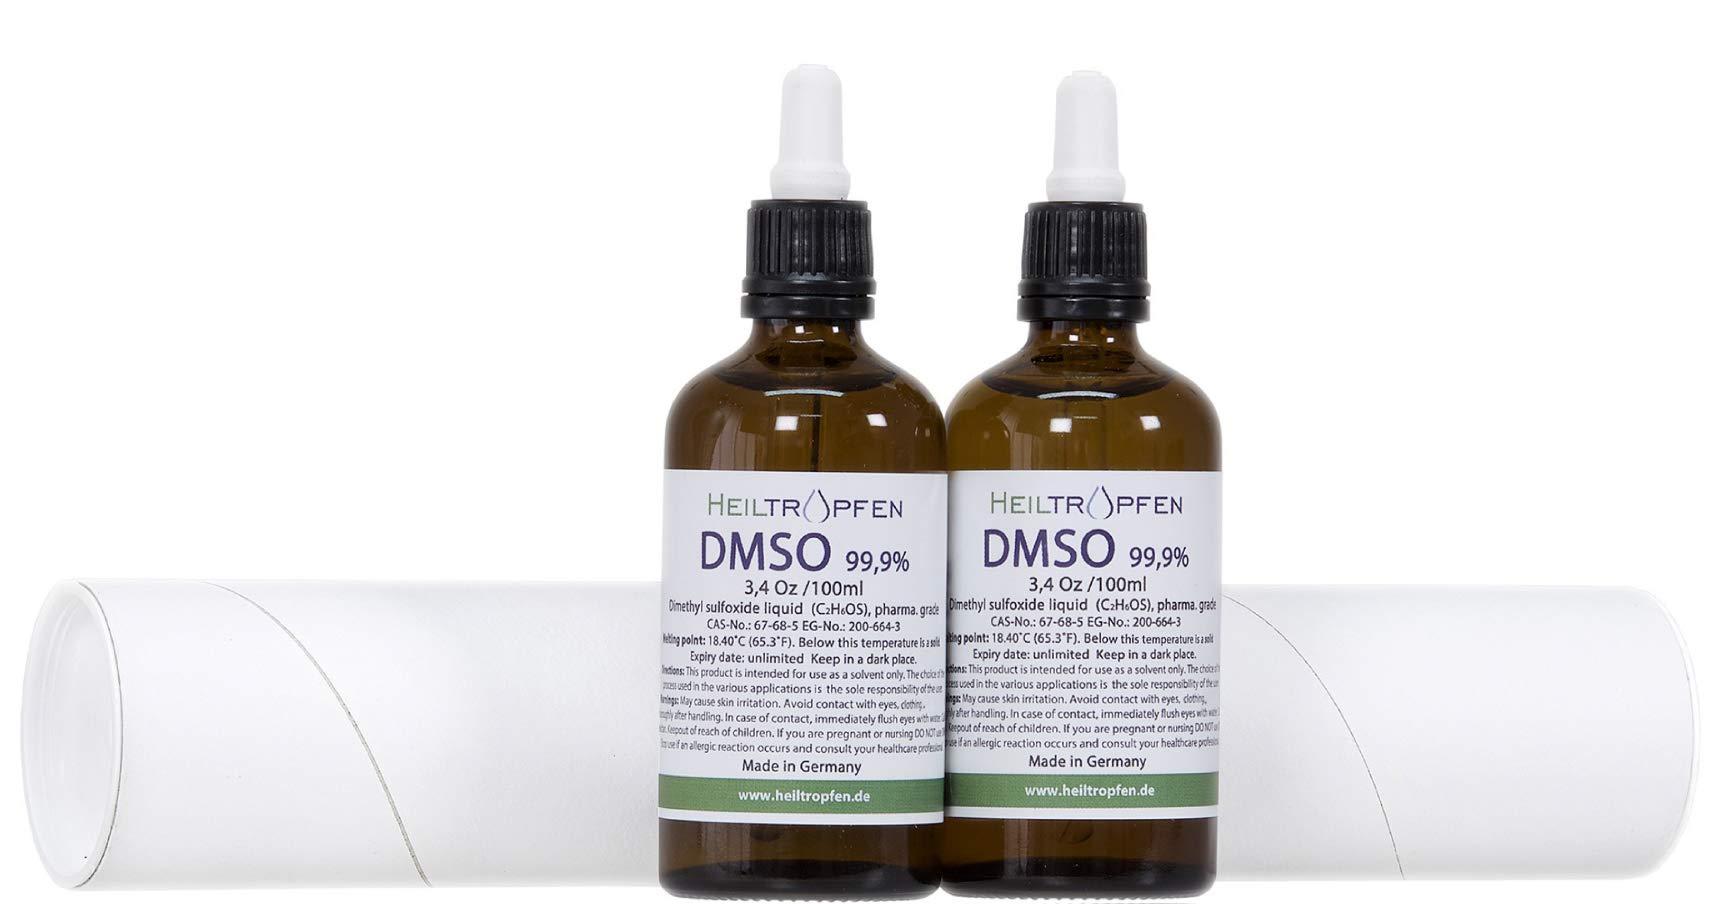 2x DMSO 99.9% Pharma grade - Dimethyl sulfoxide liquid (2x 3.4 Oz - 2x 100ml), High purity, Set of two, Heiltropfen